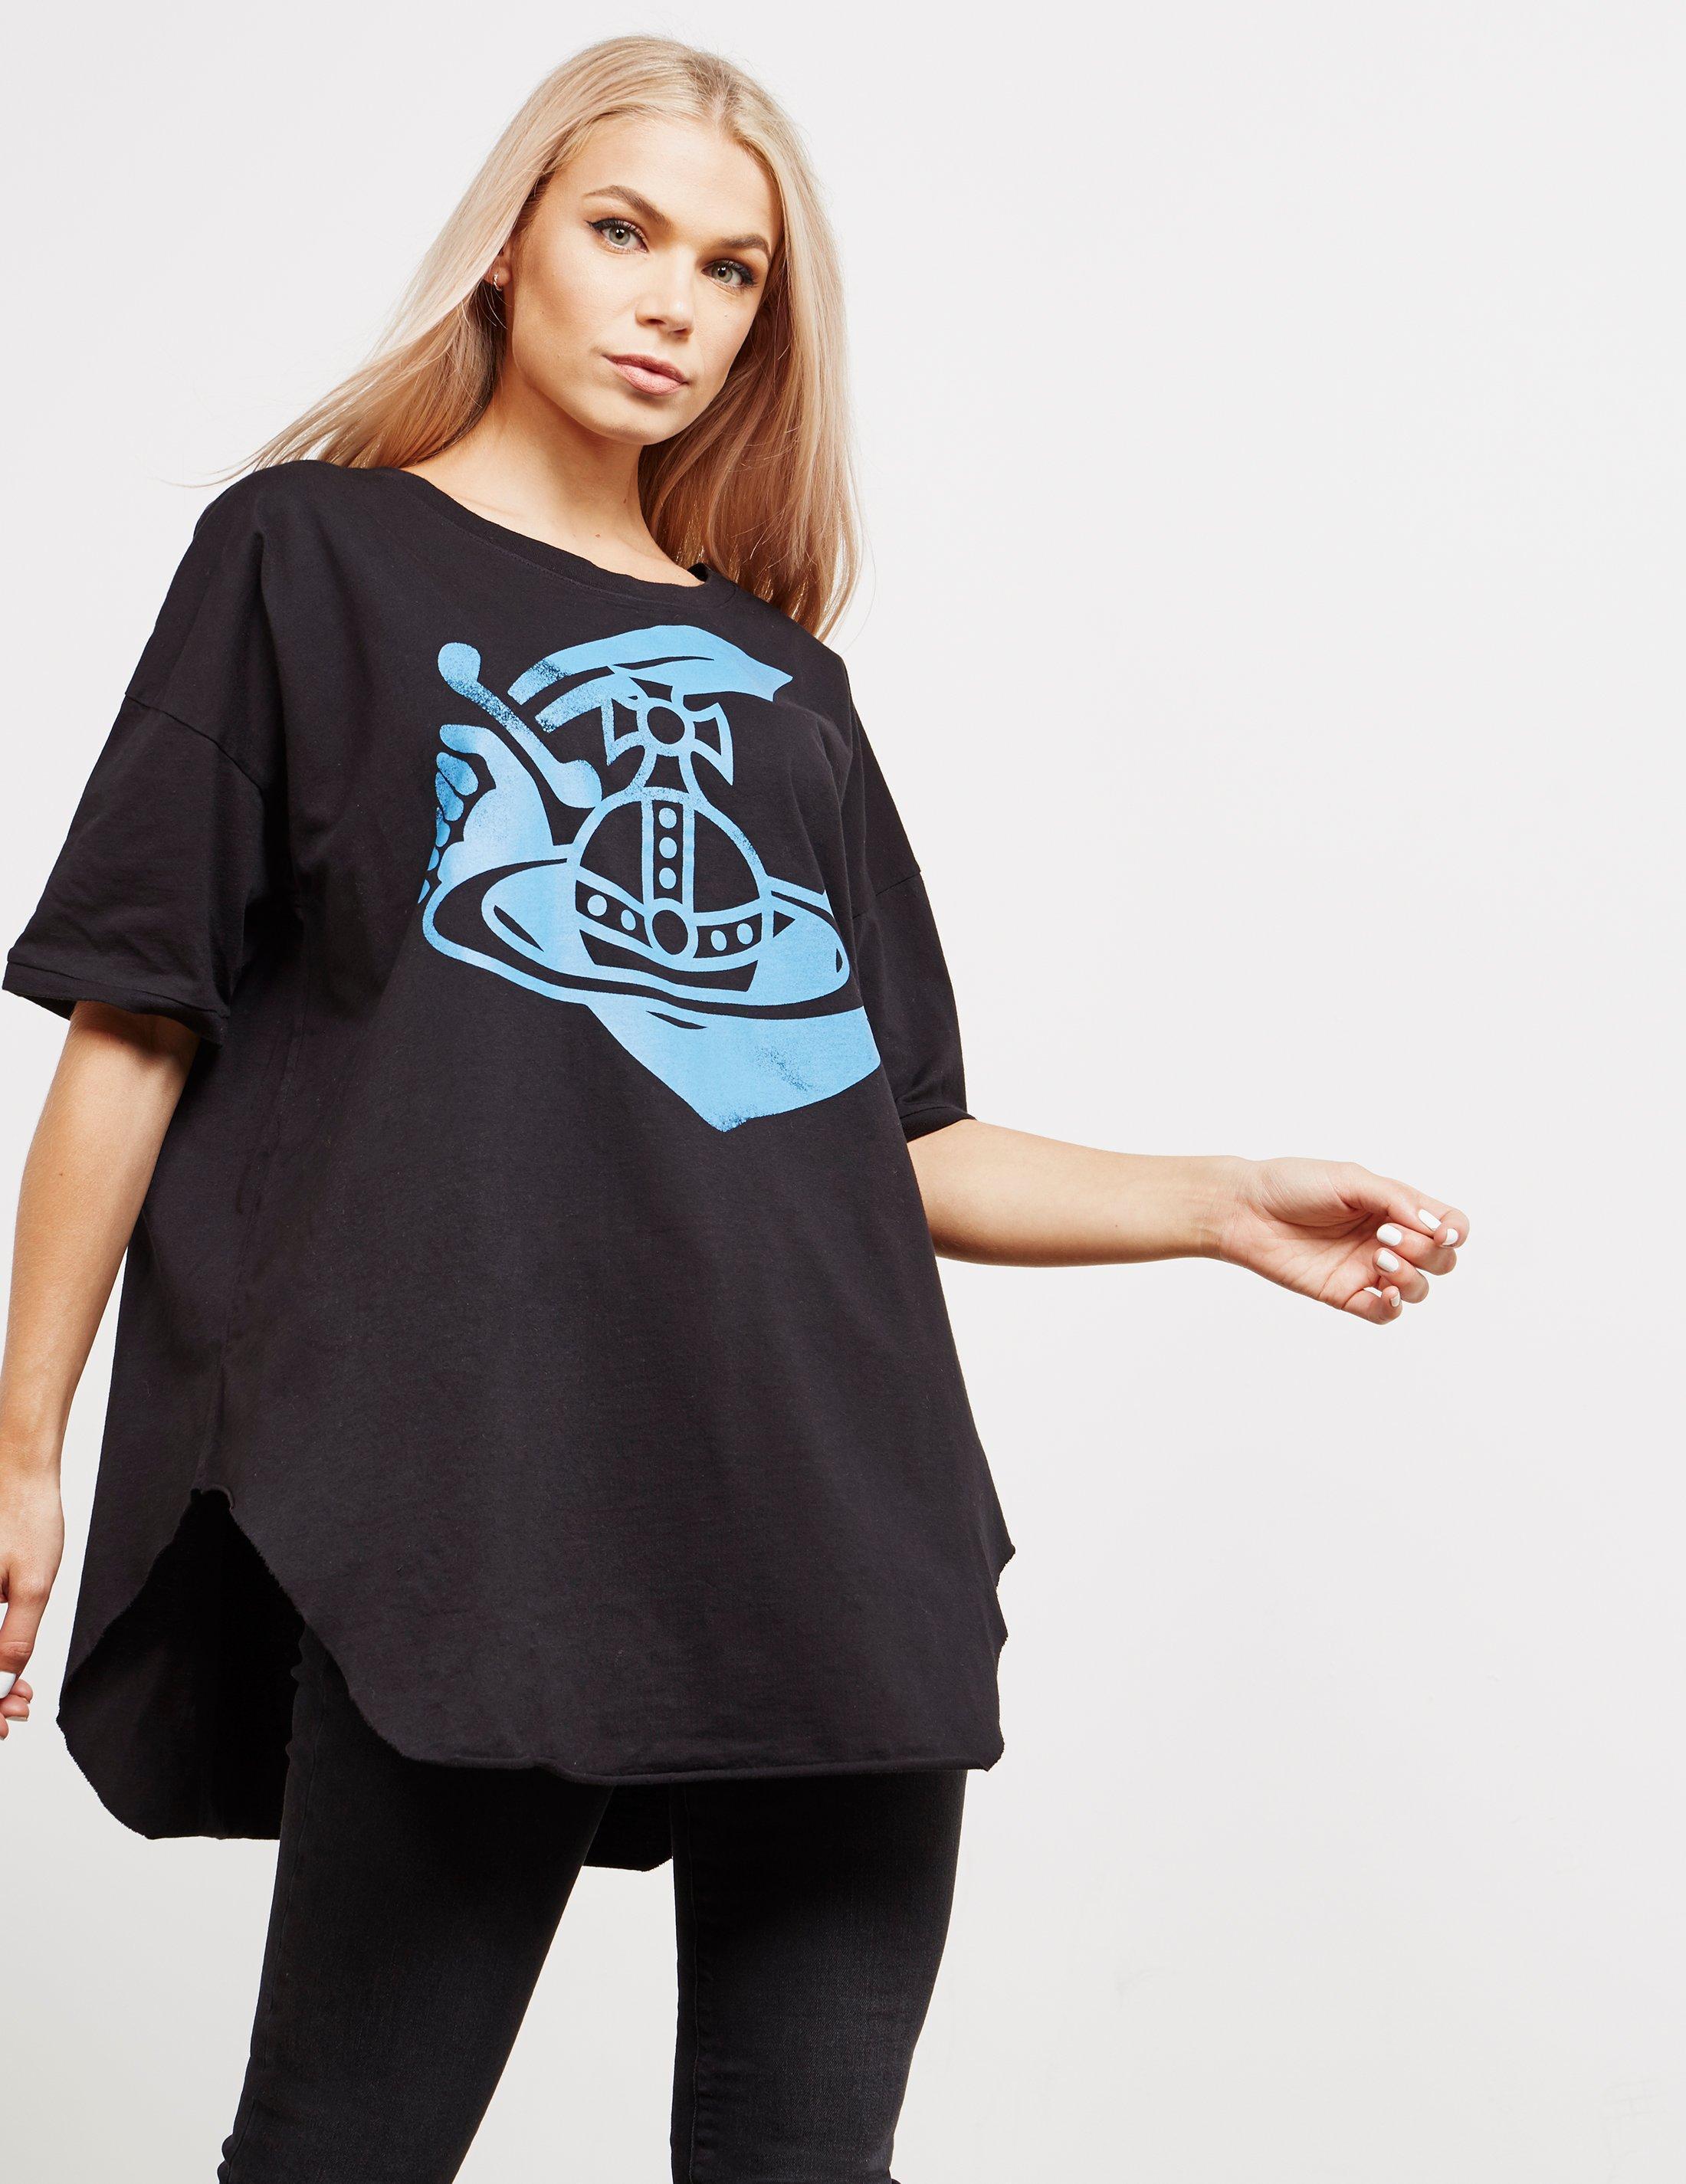 42d6b780298c38 Vivienne Westwood Anglomania Baggy Logo Short Sleeve T-shirt Black ...